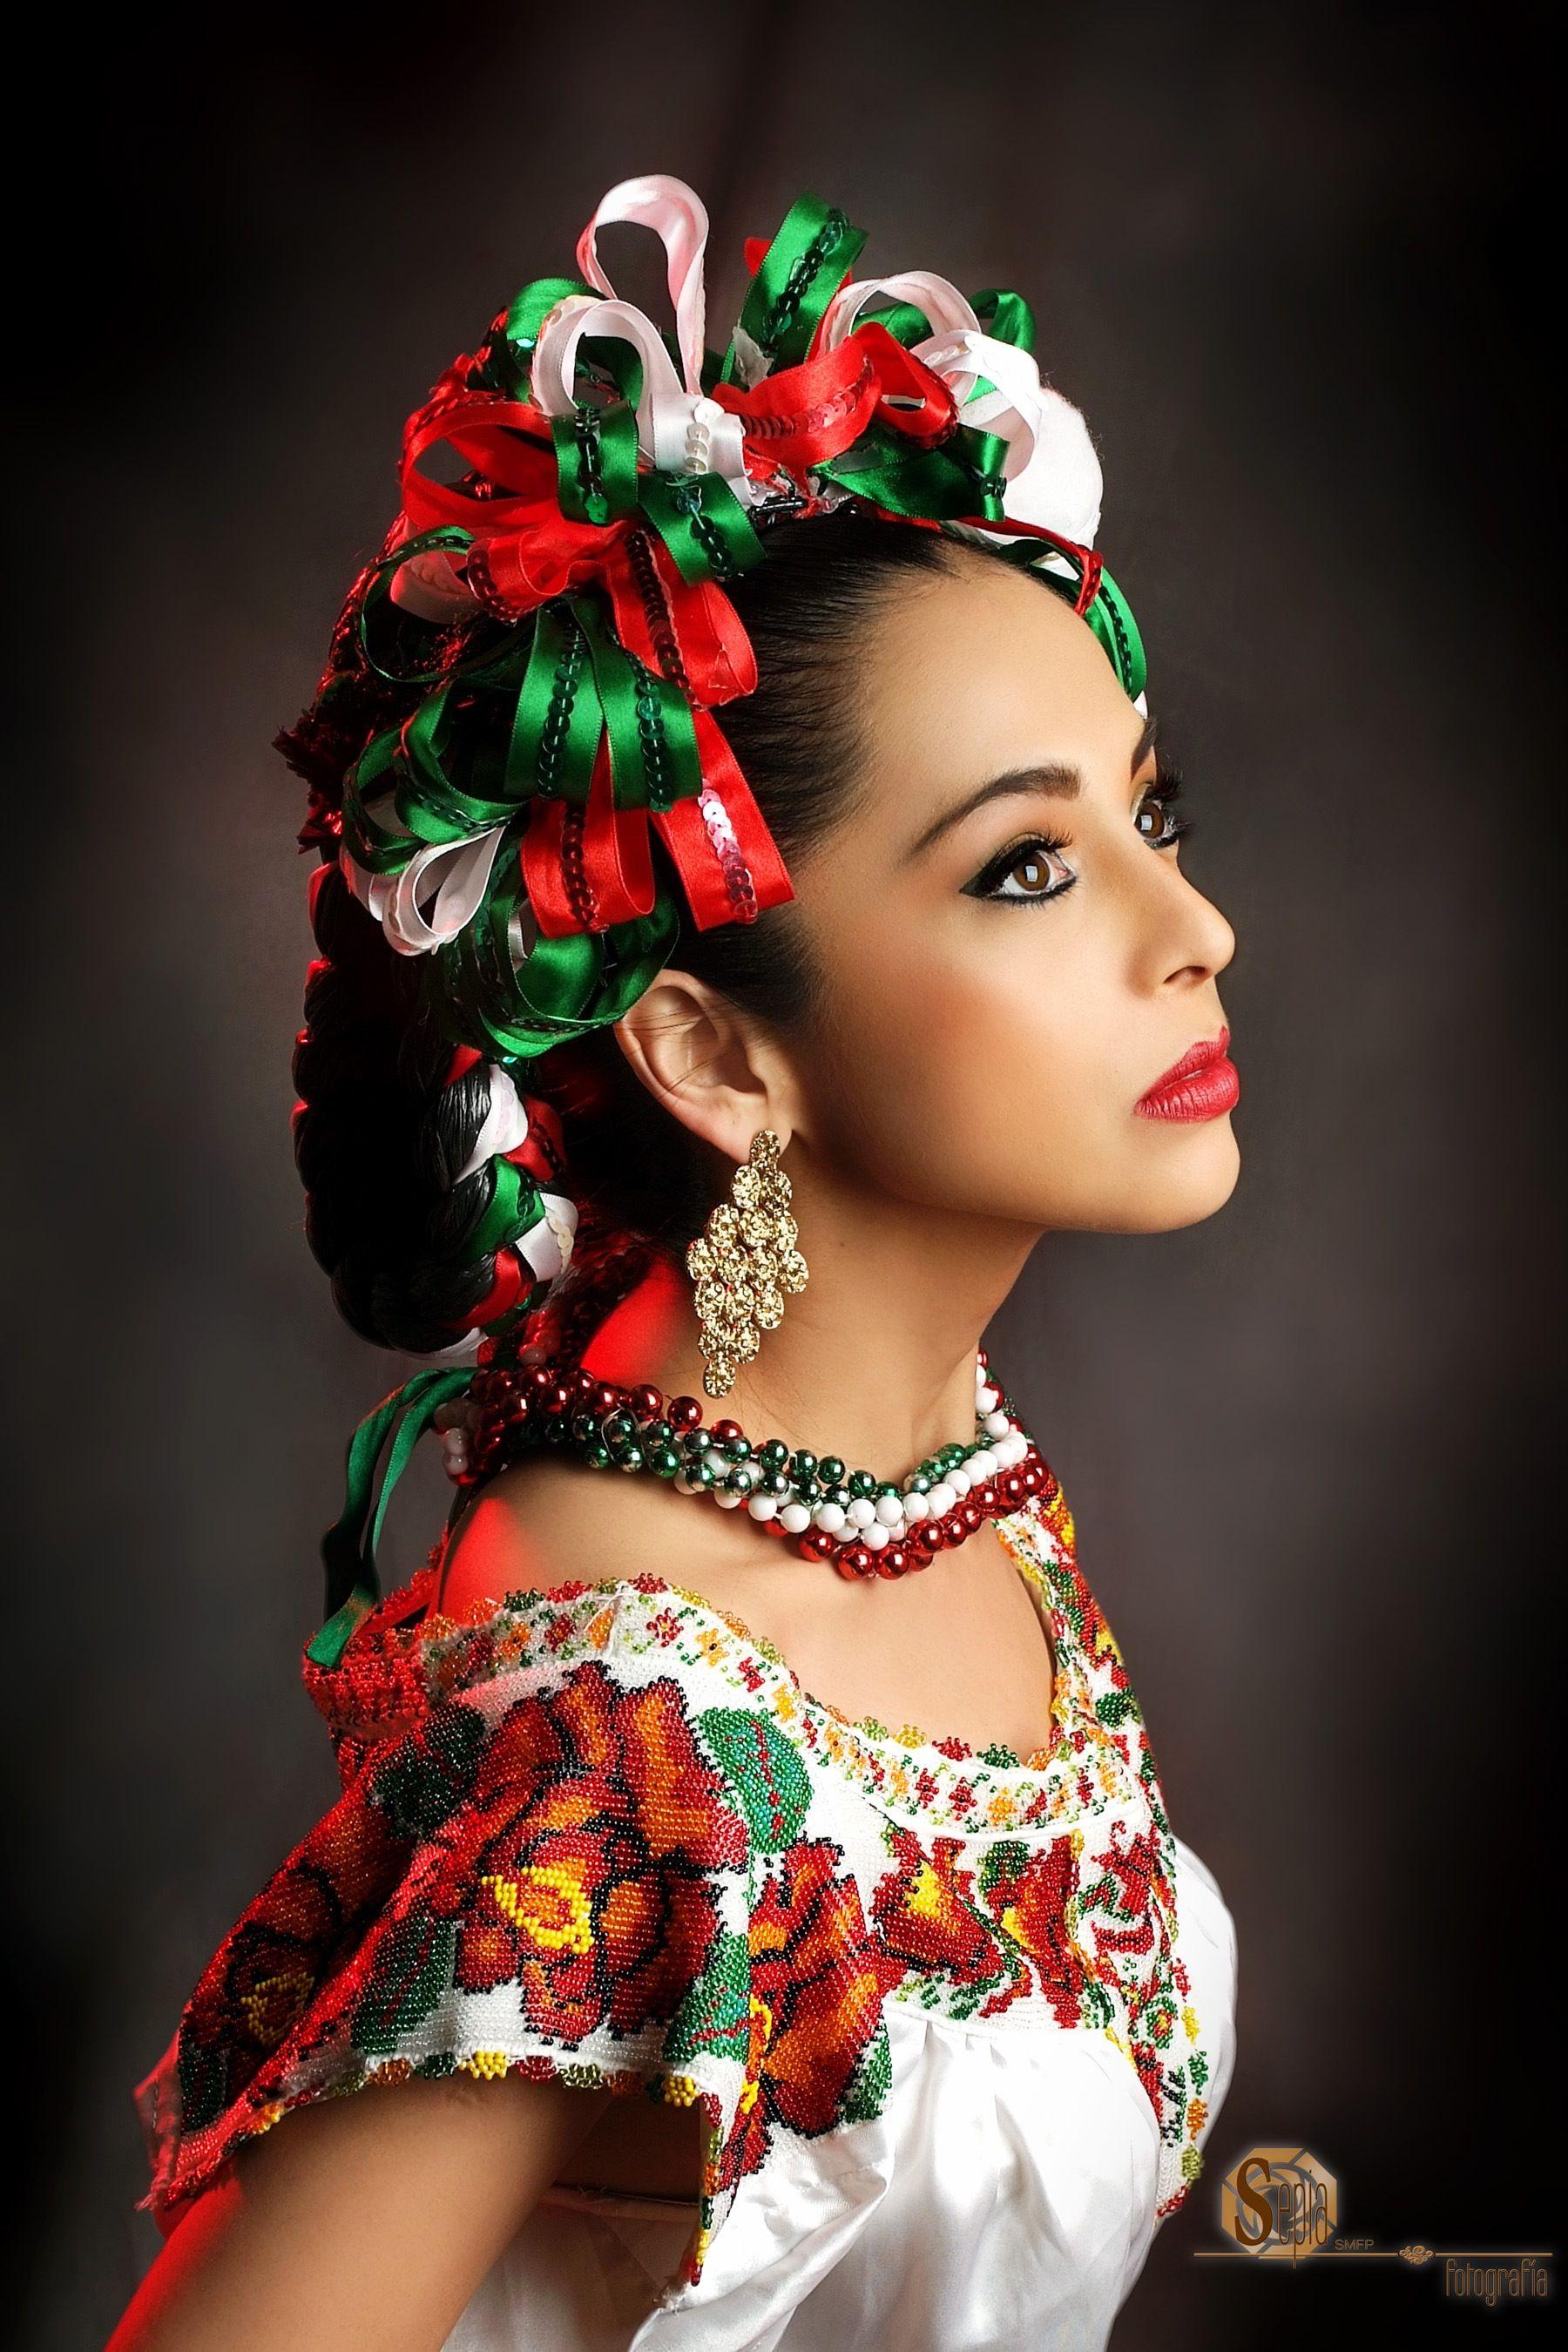 Pin by Hek on VIVA MÉXICO!! VIVA!! | Mexican women